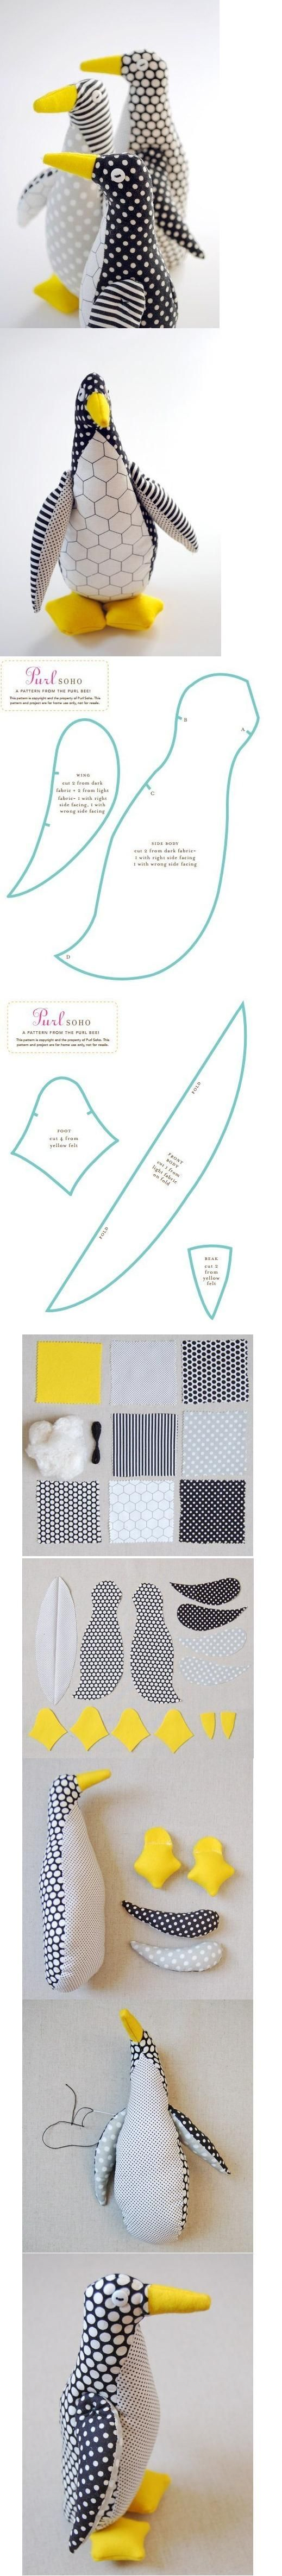 Cojines para tu Bebe-bebeazul.top (3)